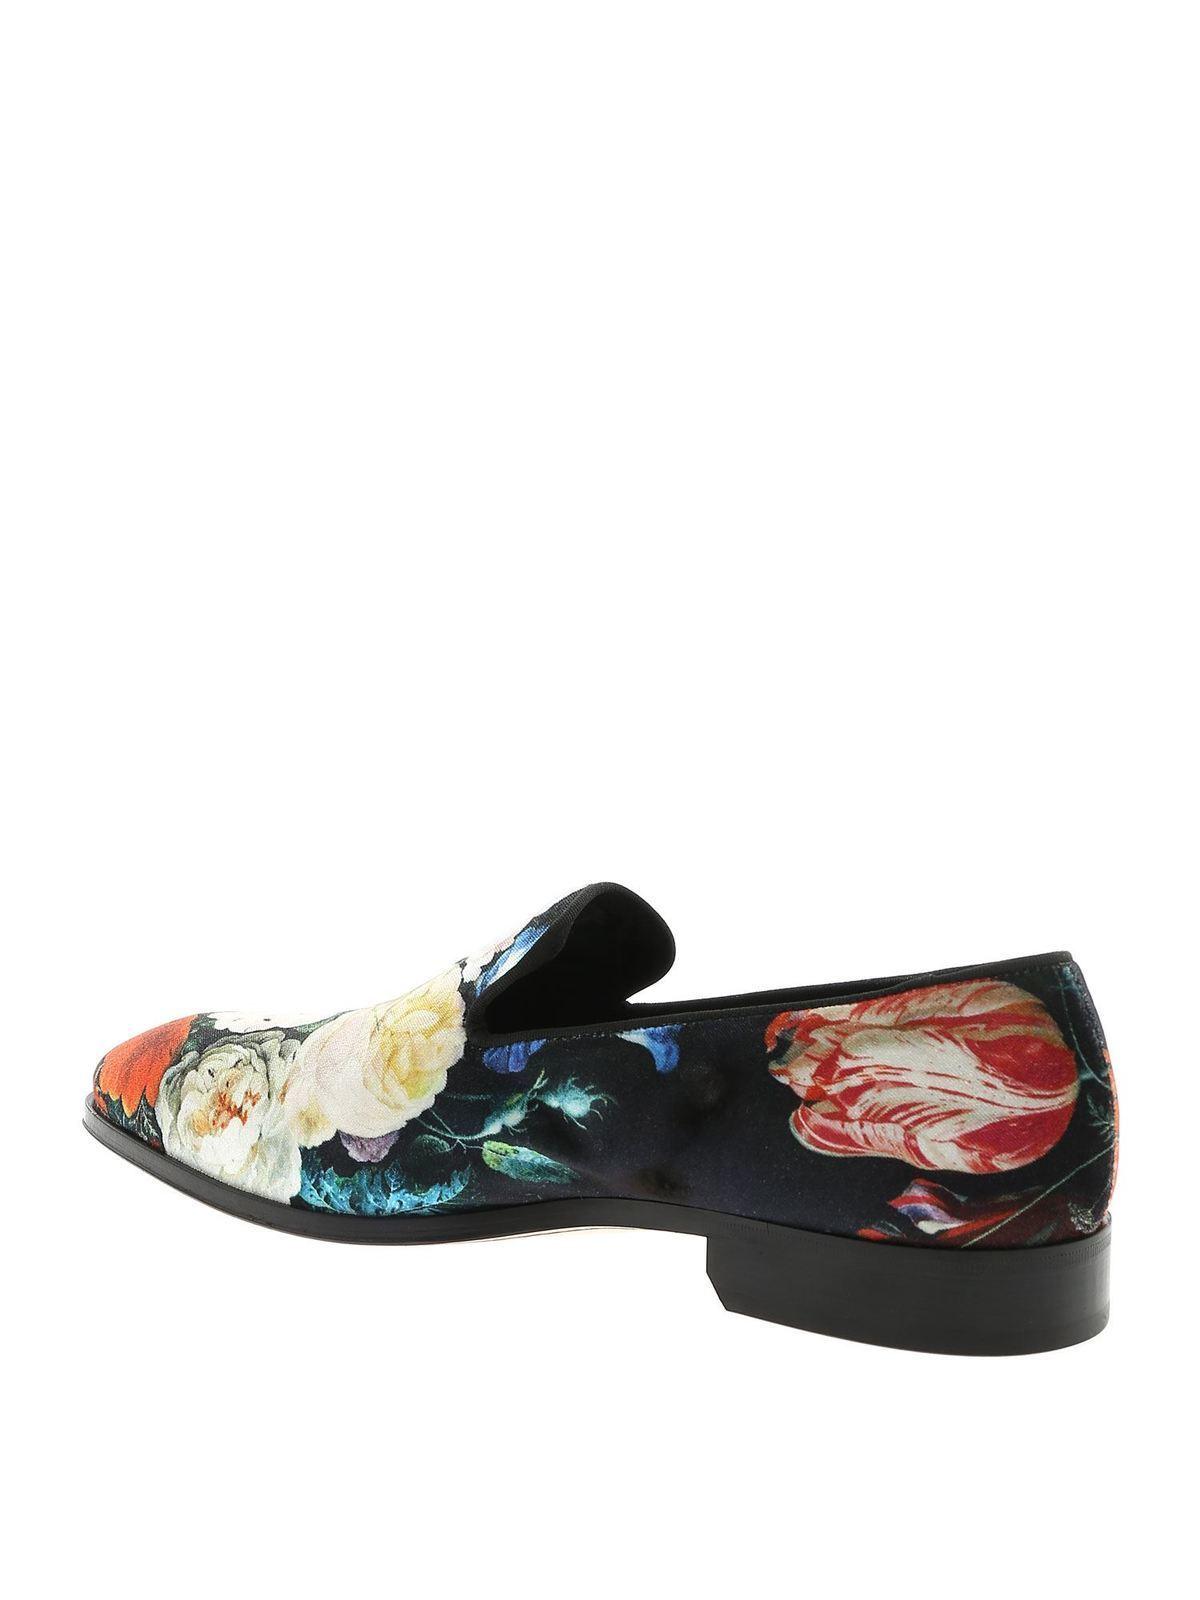 Paul Smith - Tudor multicolor loafers